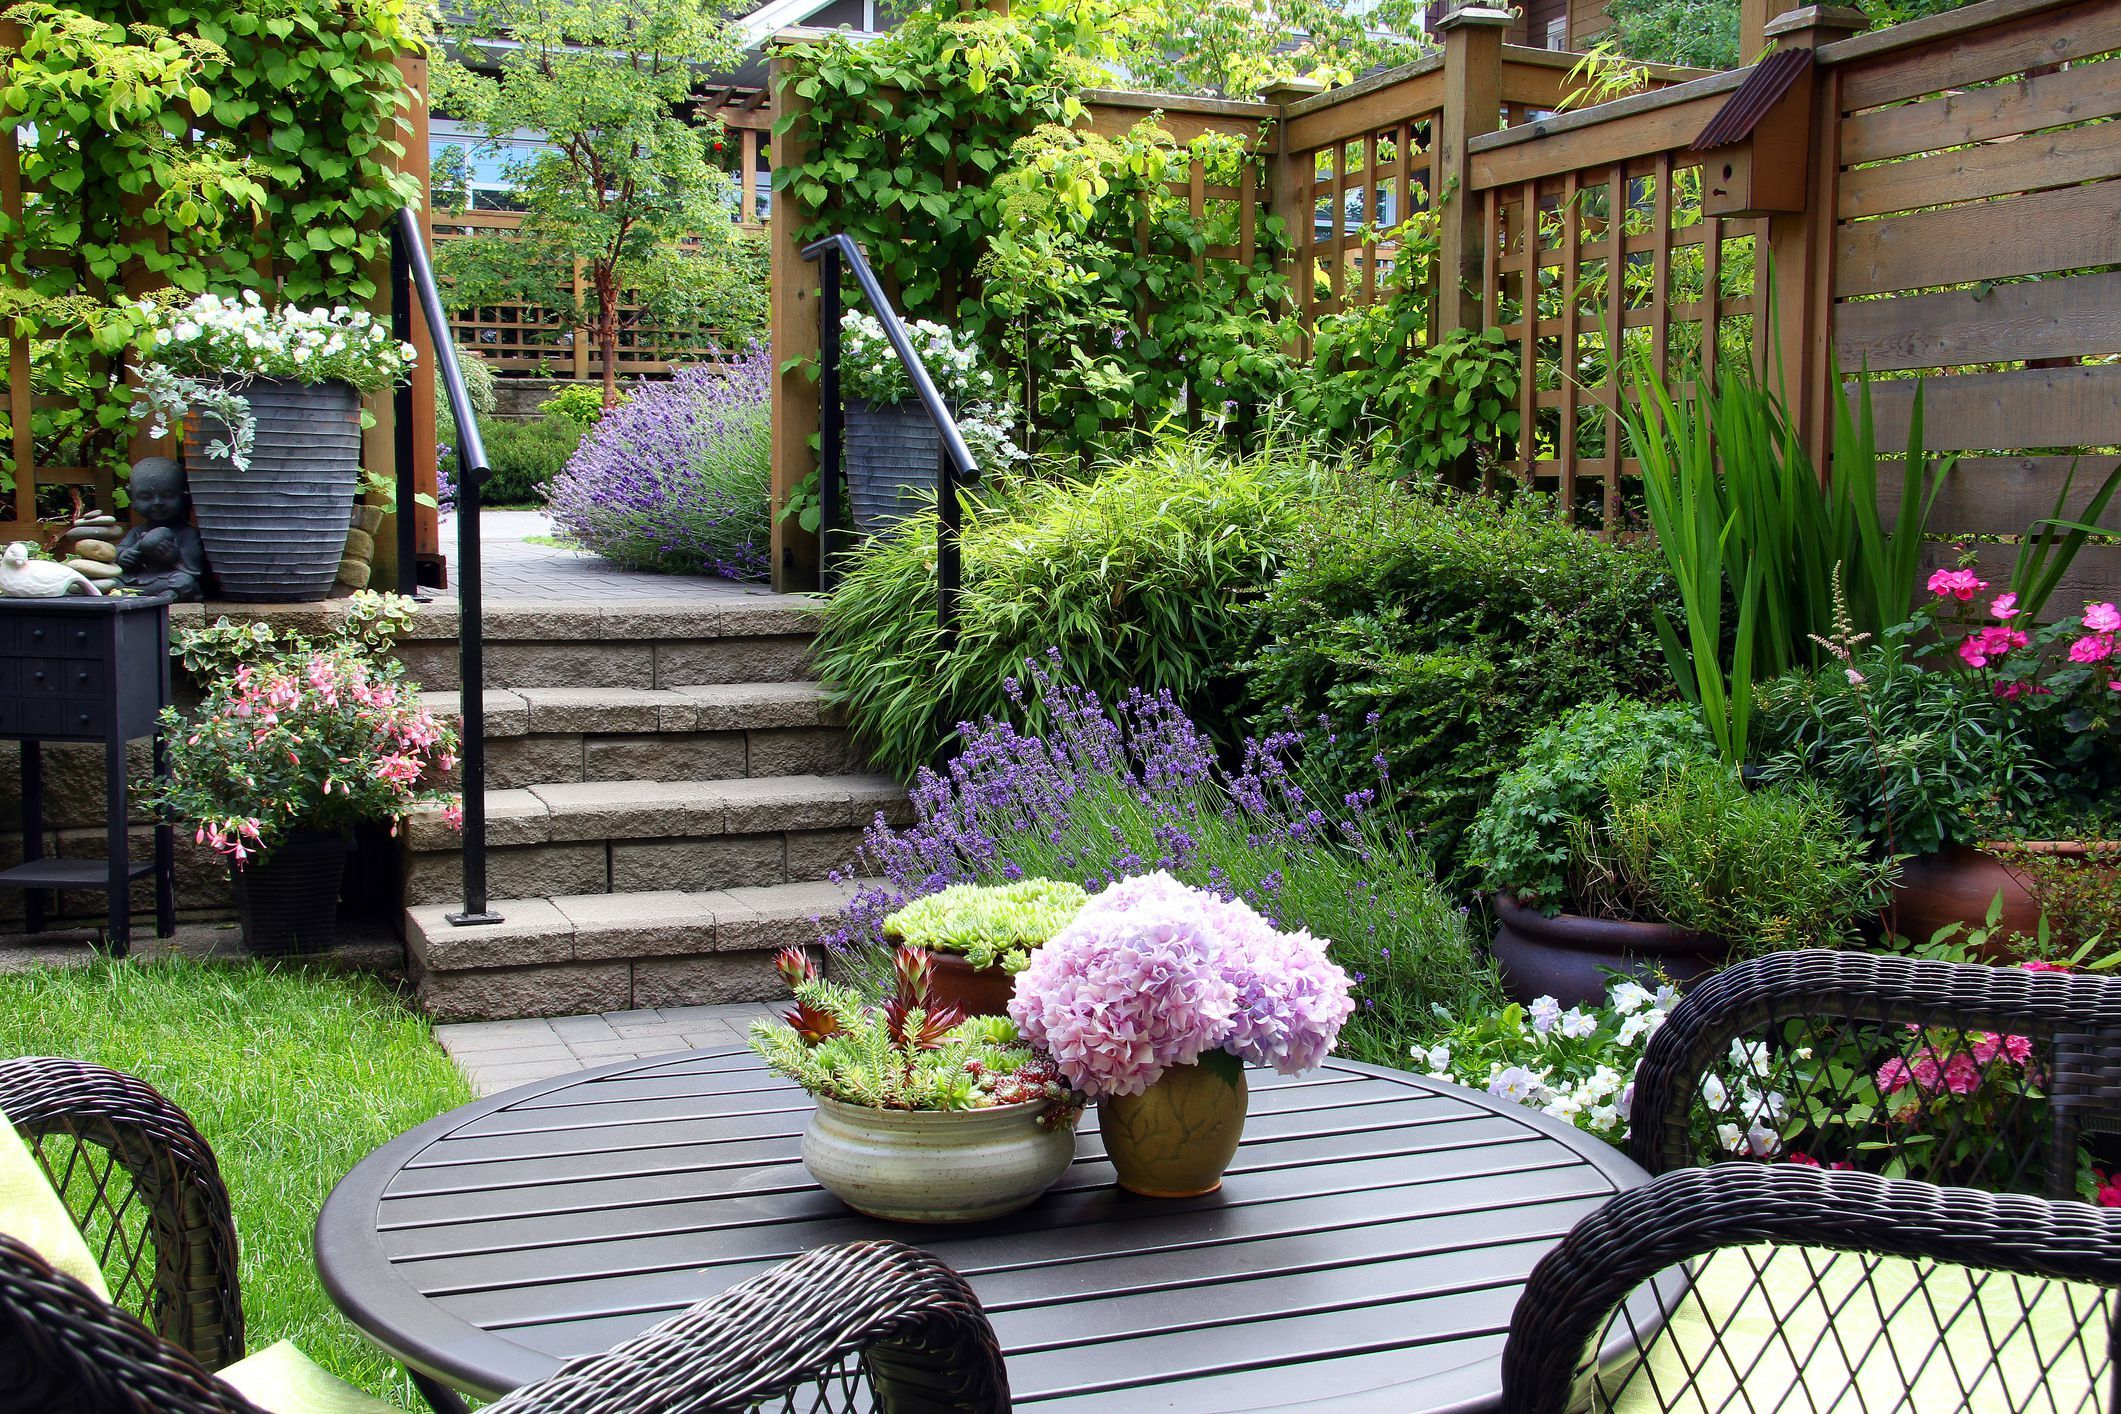 10 Small Garden Design Ideas From Gardeners World S Joe Swift Small Yard Landscaping Small Garden Design Backyard Landscaping Designs